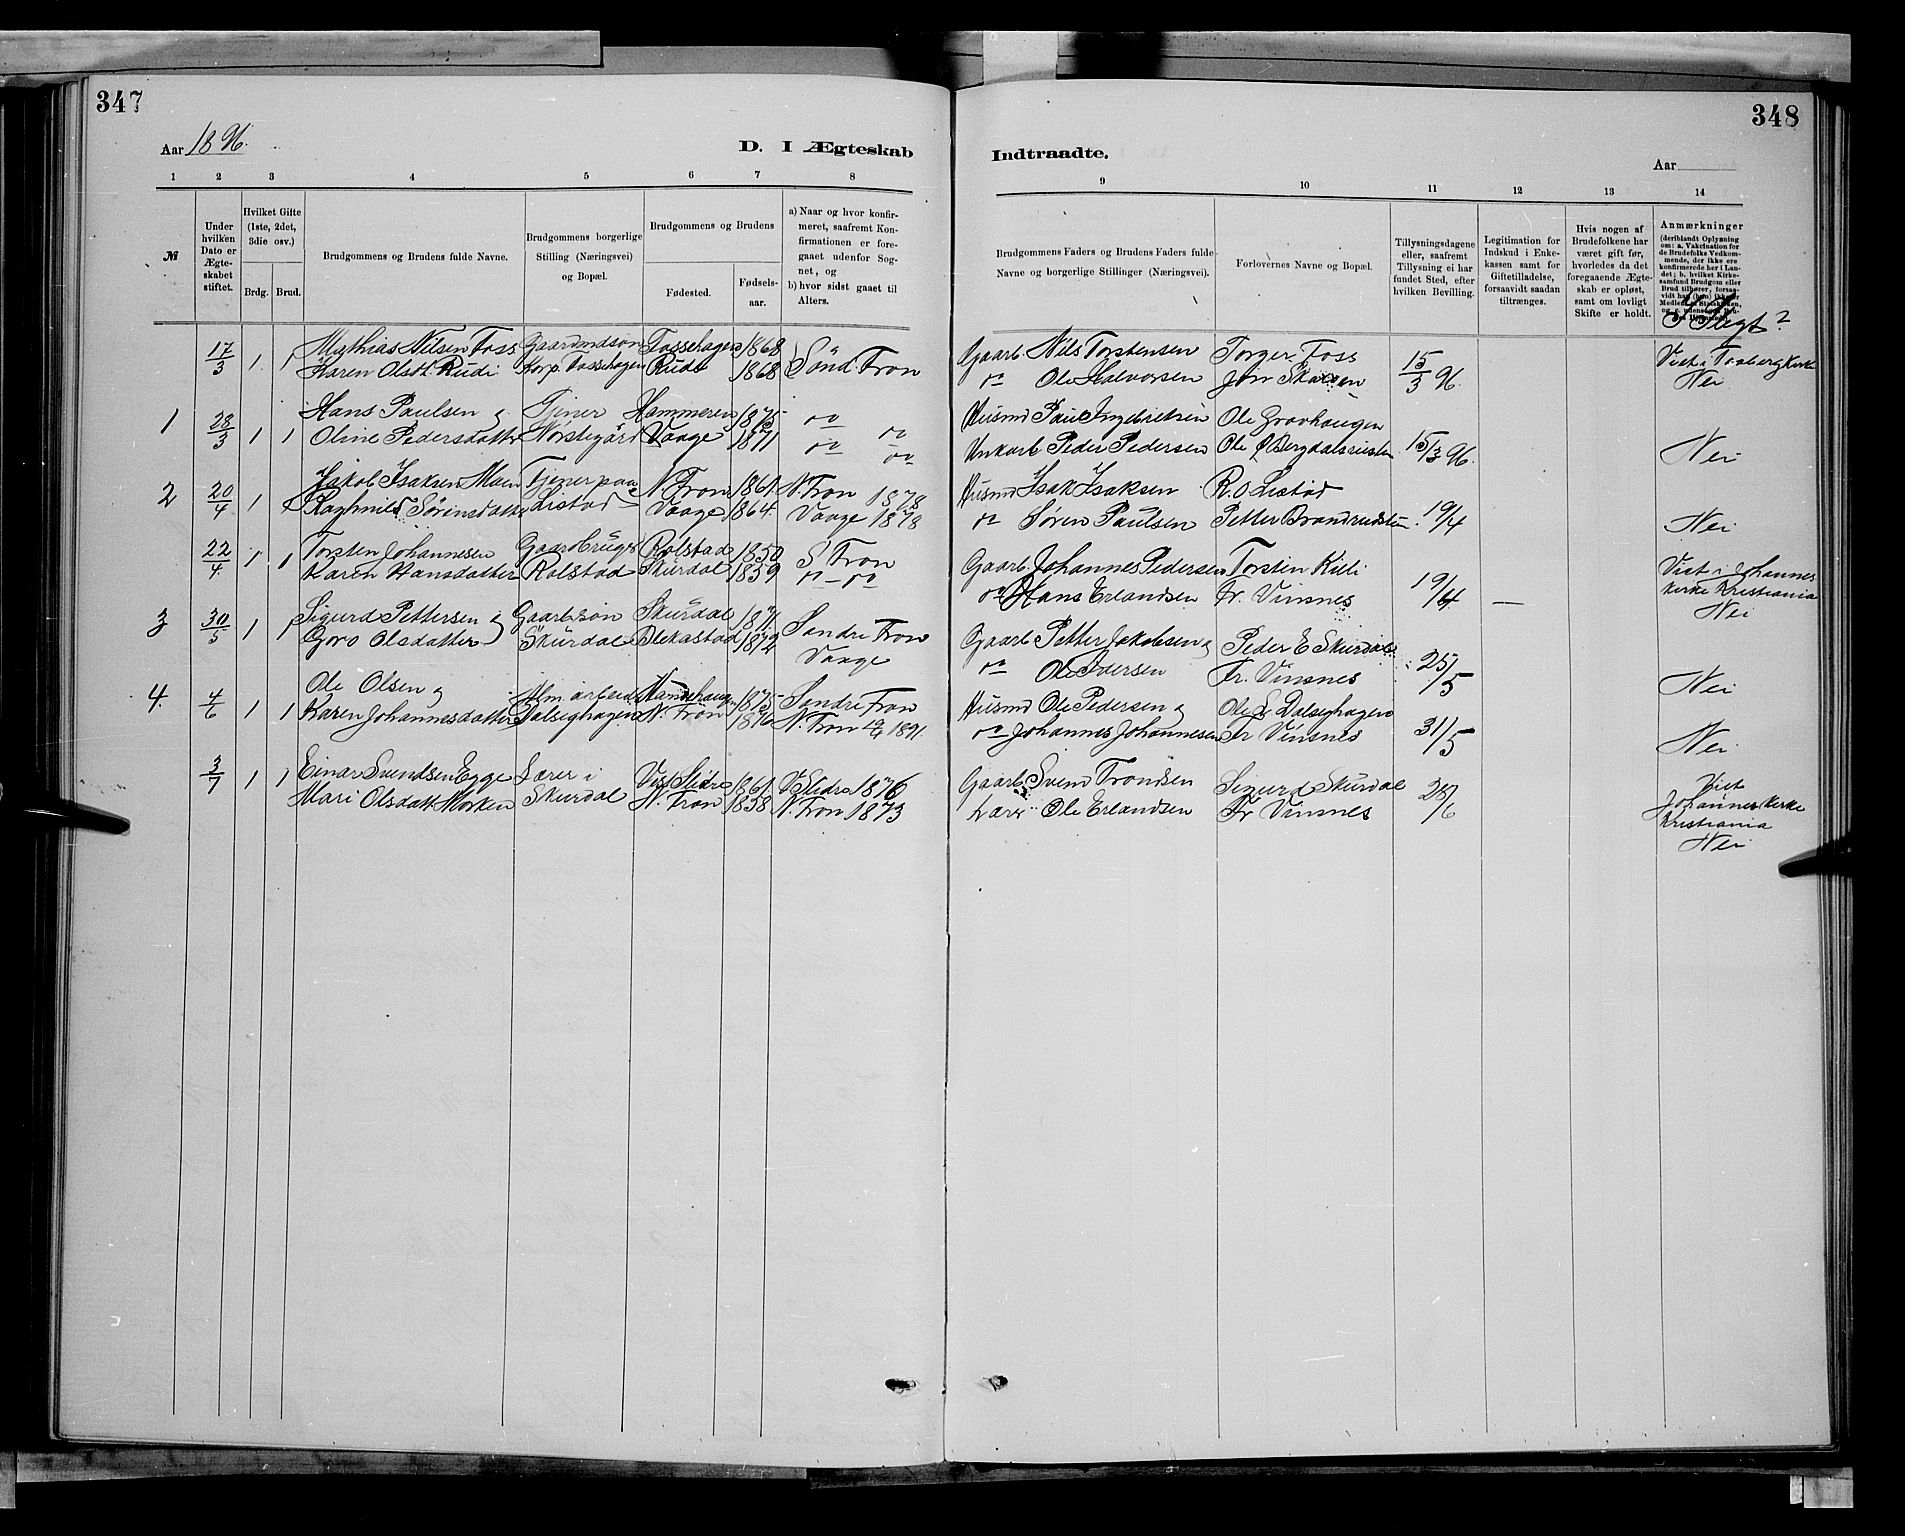 SAH, Sør-Fron prestekontor, H/Ha/Hab/L0003: Klokkerbok nr. 3, 1884-1896, s. 347-348